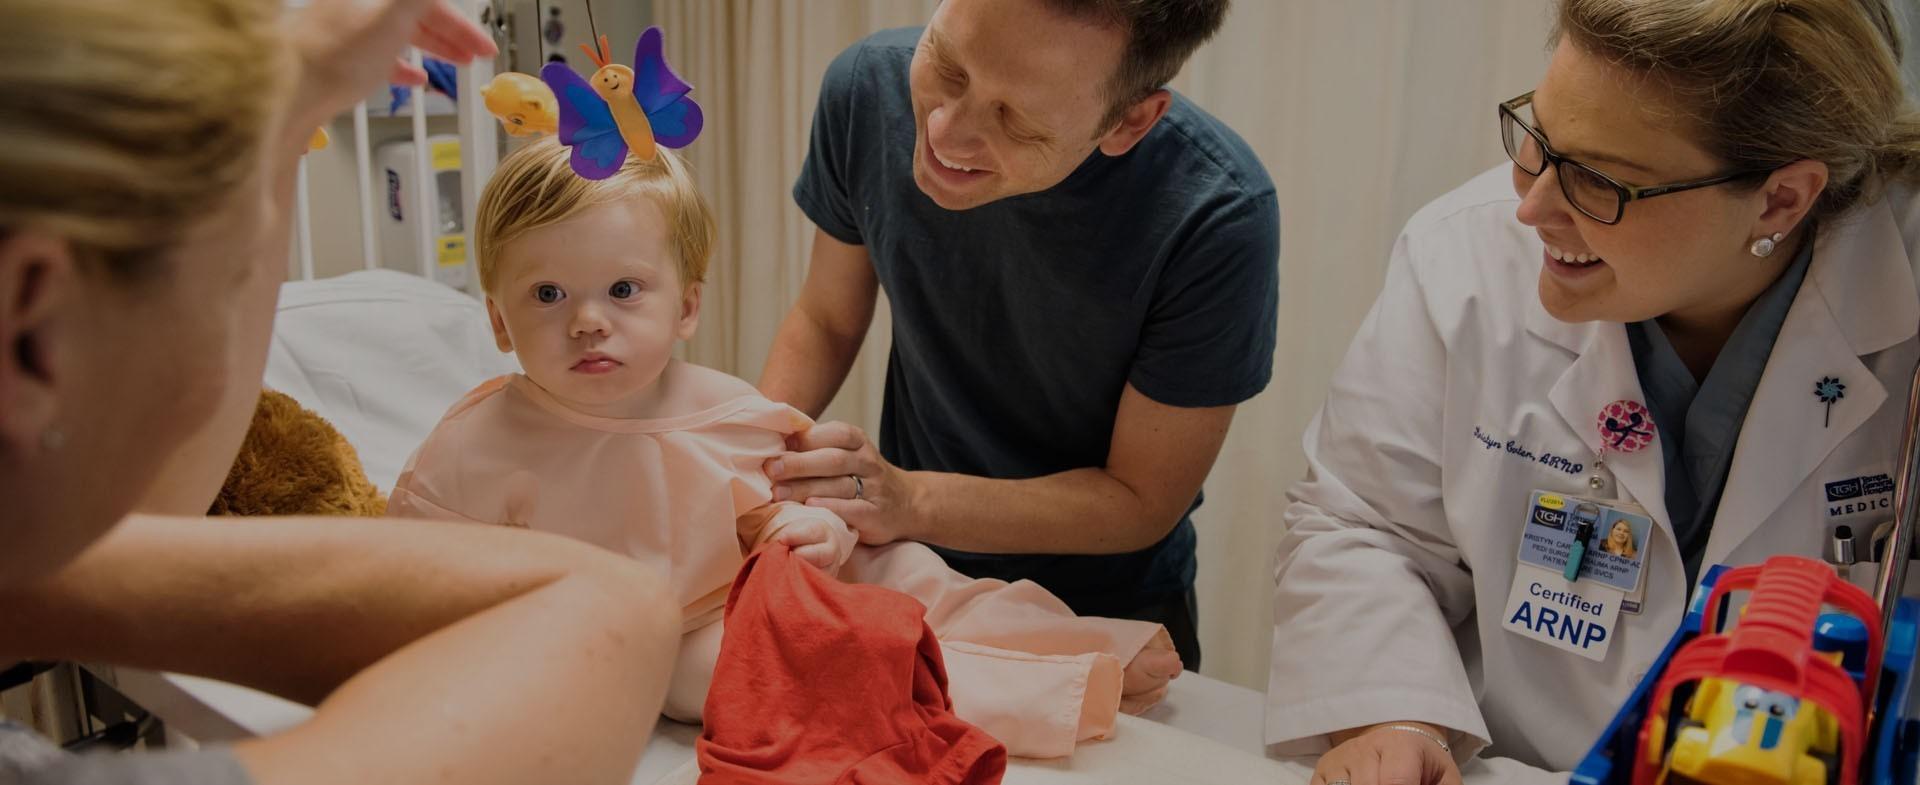 pediatric kidcare sick child day care tampa general hospital